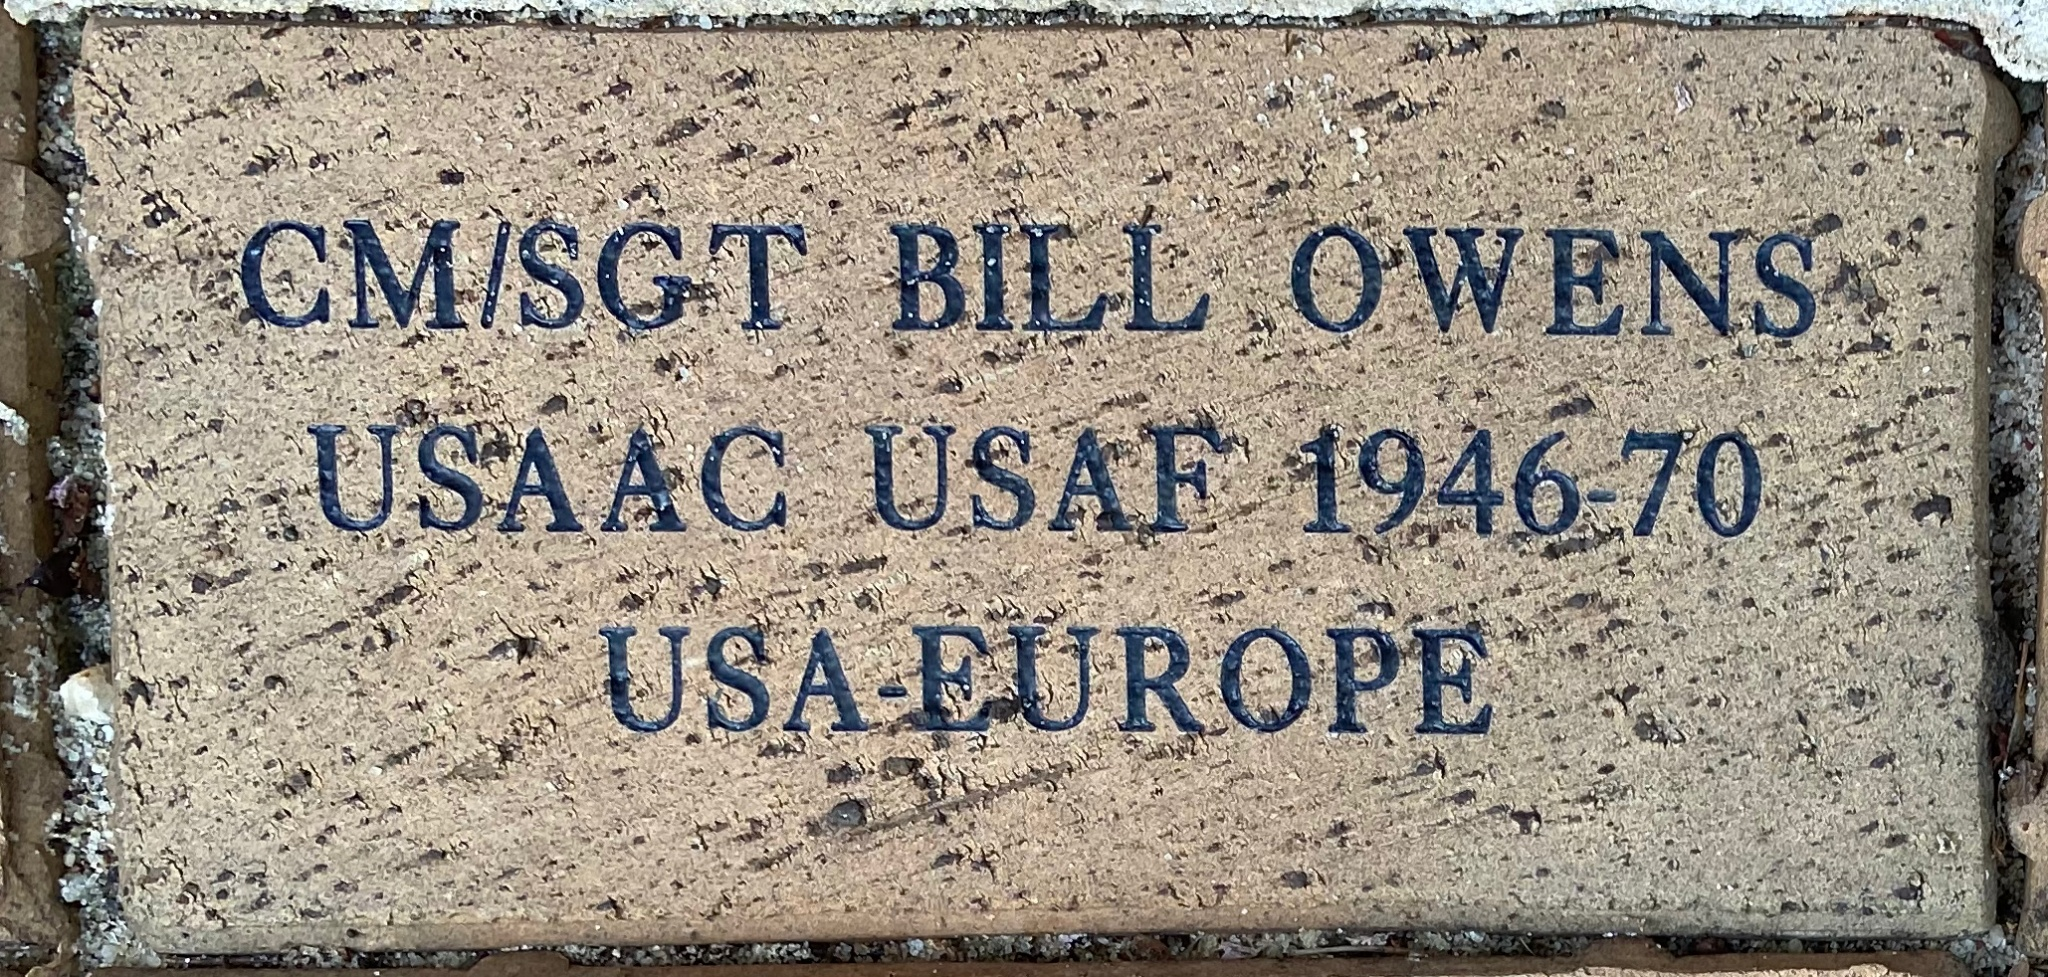 CM/SGT BILL OWENS USAAC USAF 1946-70 USA-EUROPE